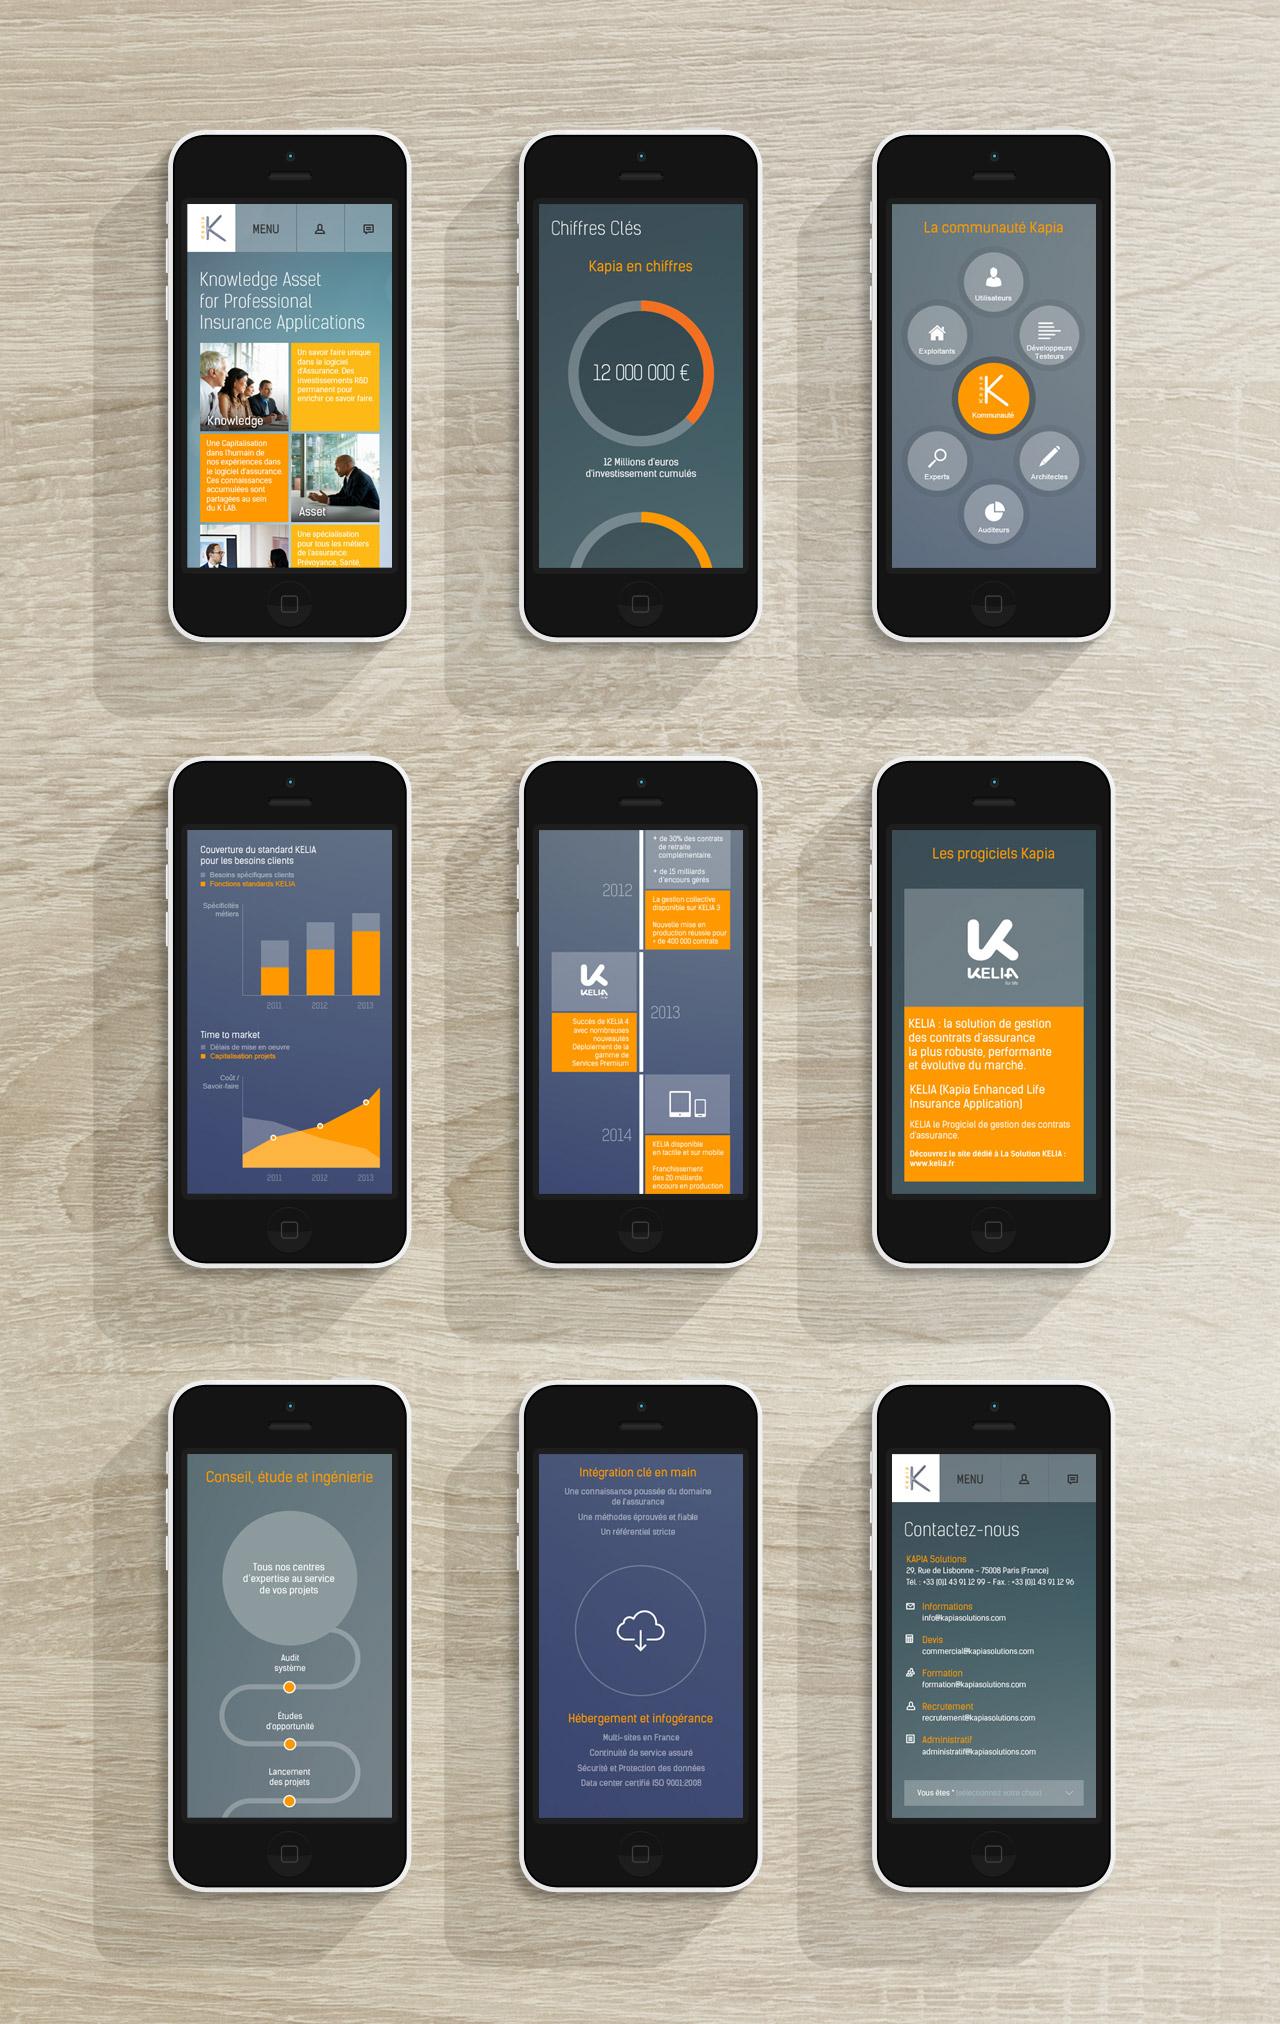 kapia-solutions-site-mobile-responsive-design-creation-communication-caconcept-alexis-cretin-graphiste